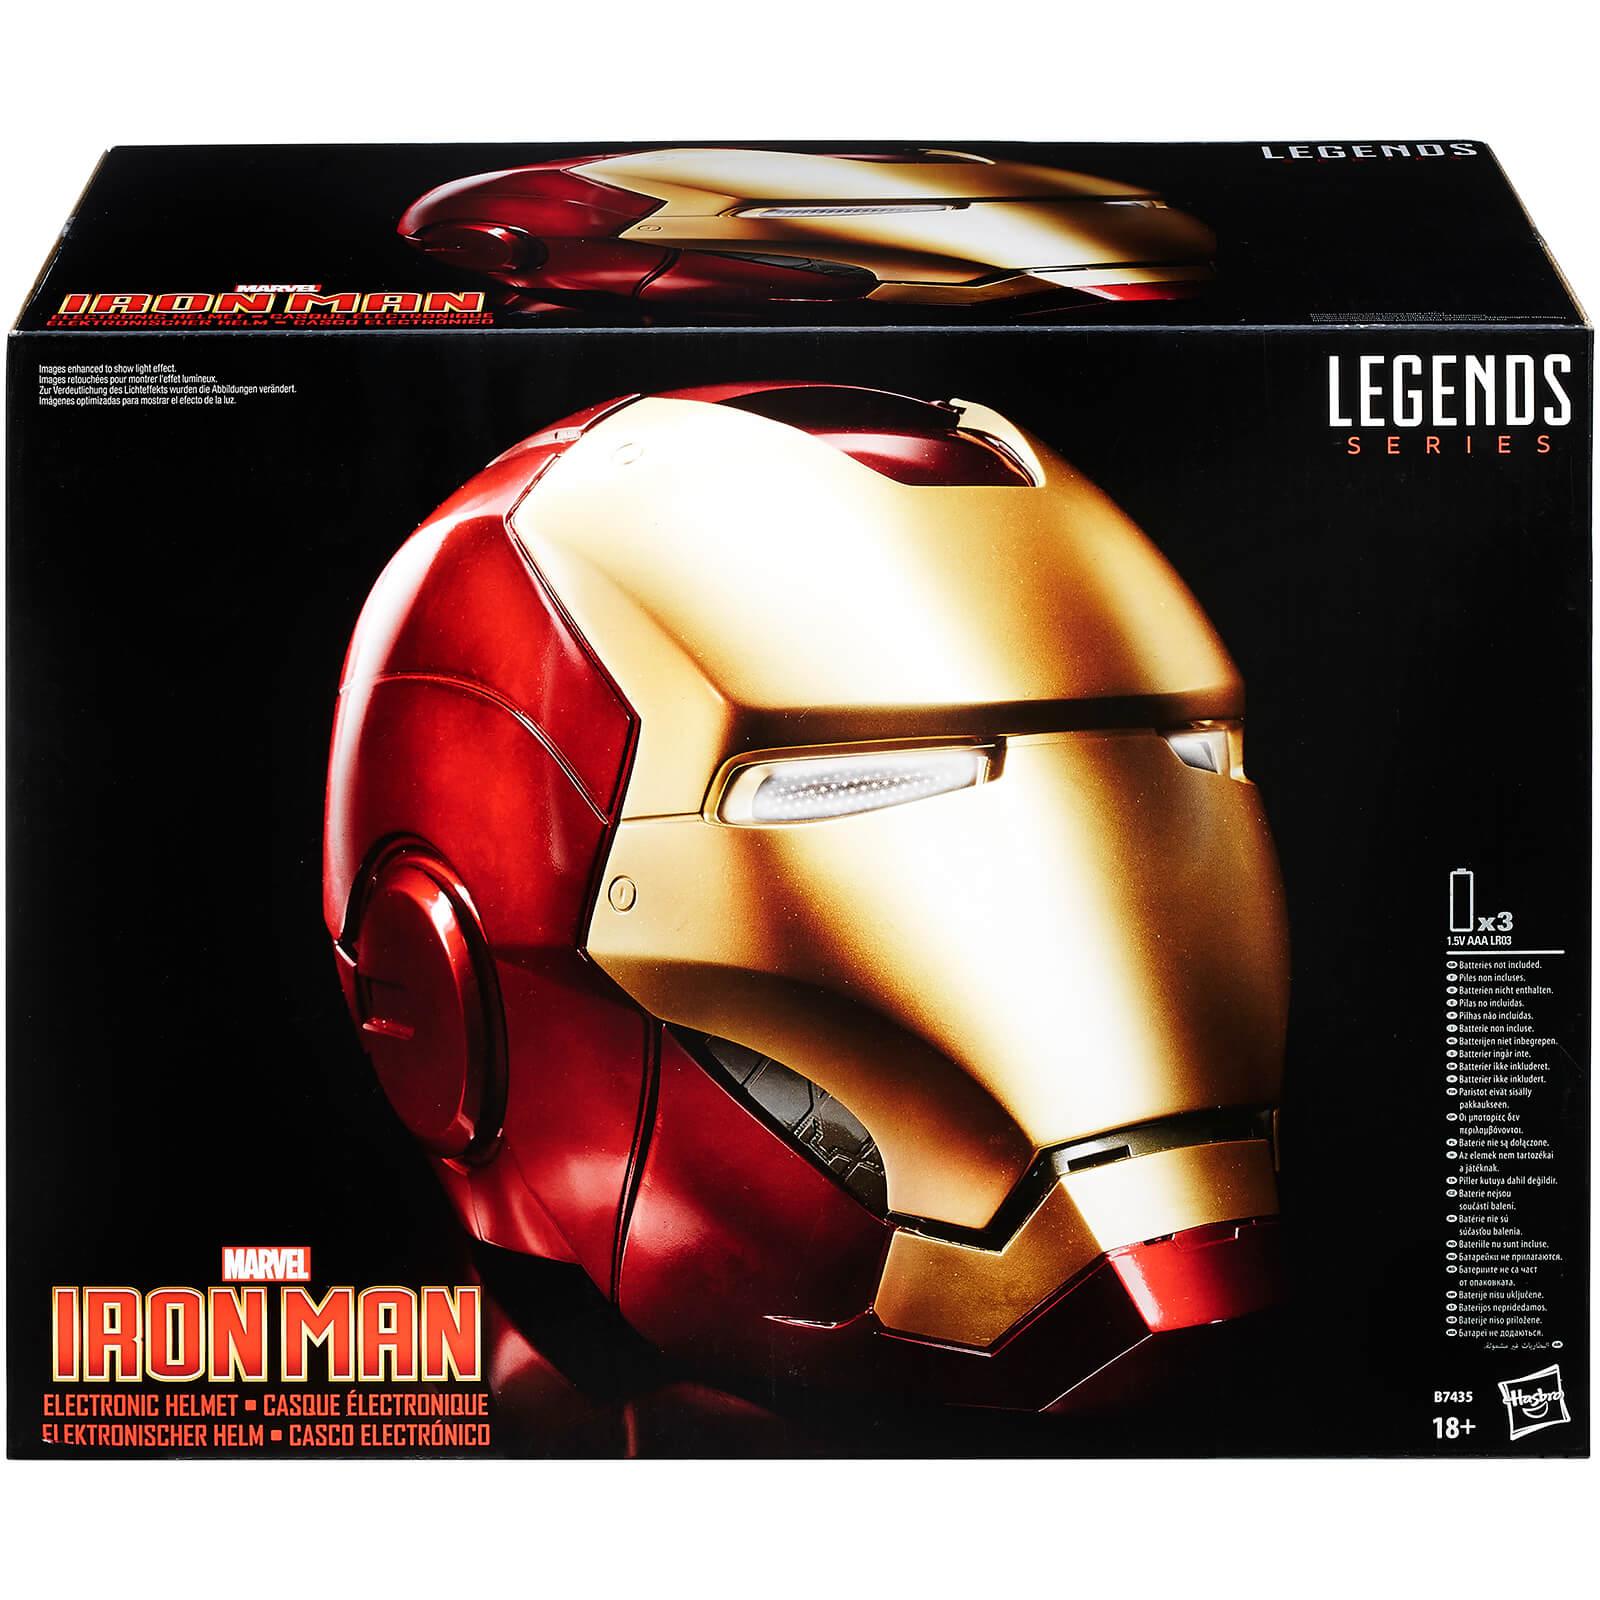 Hasbro The Avengers Marvel Legends Iron Man Electronic Helmet (Full-Scale Size)